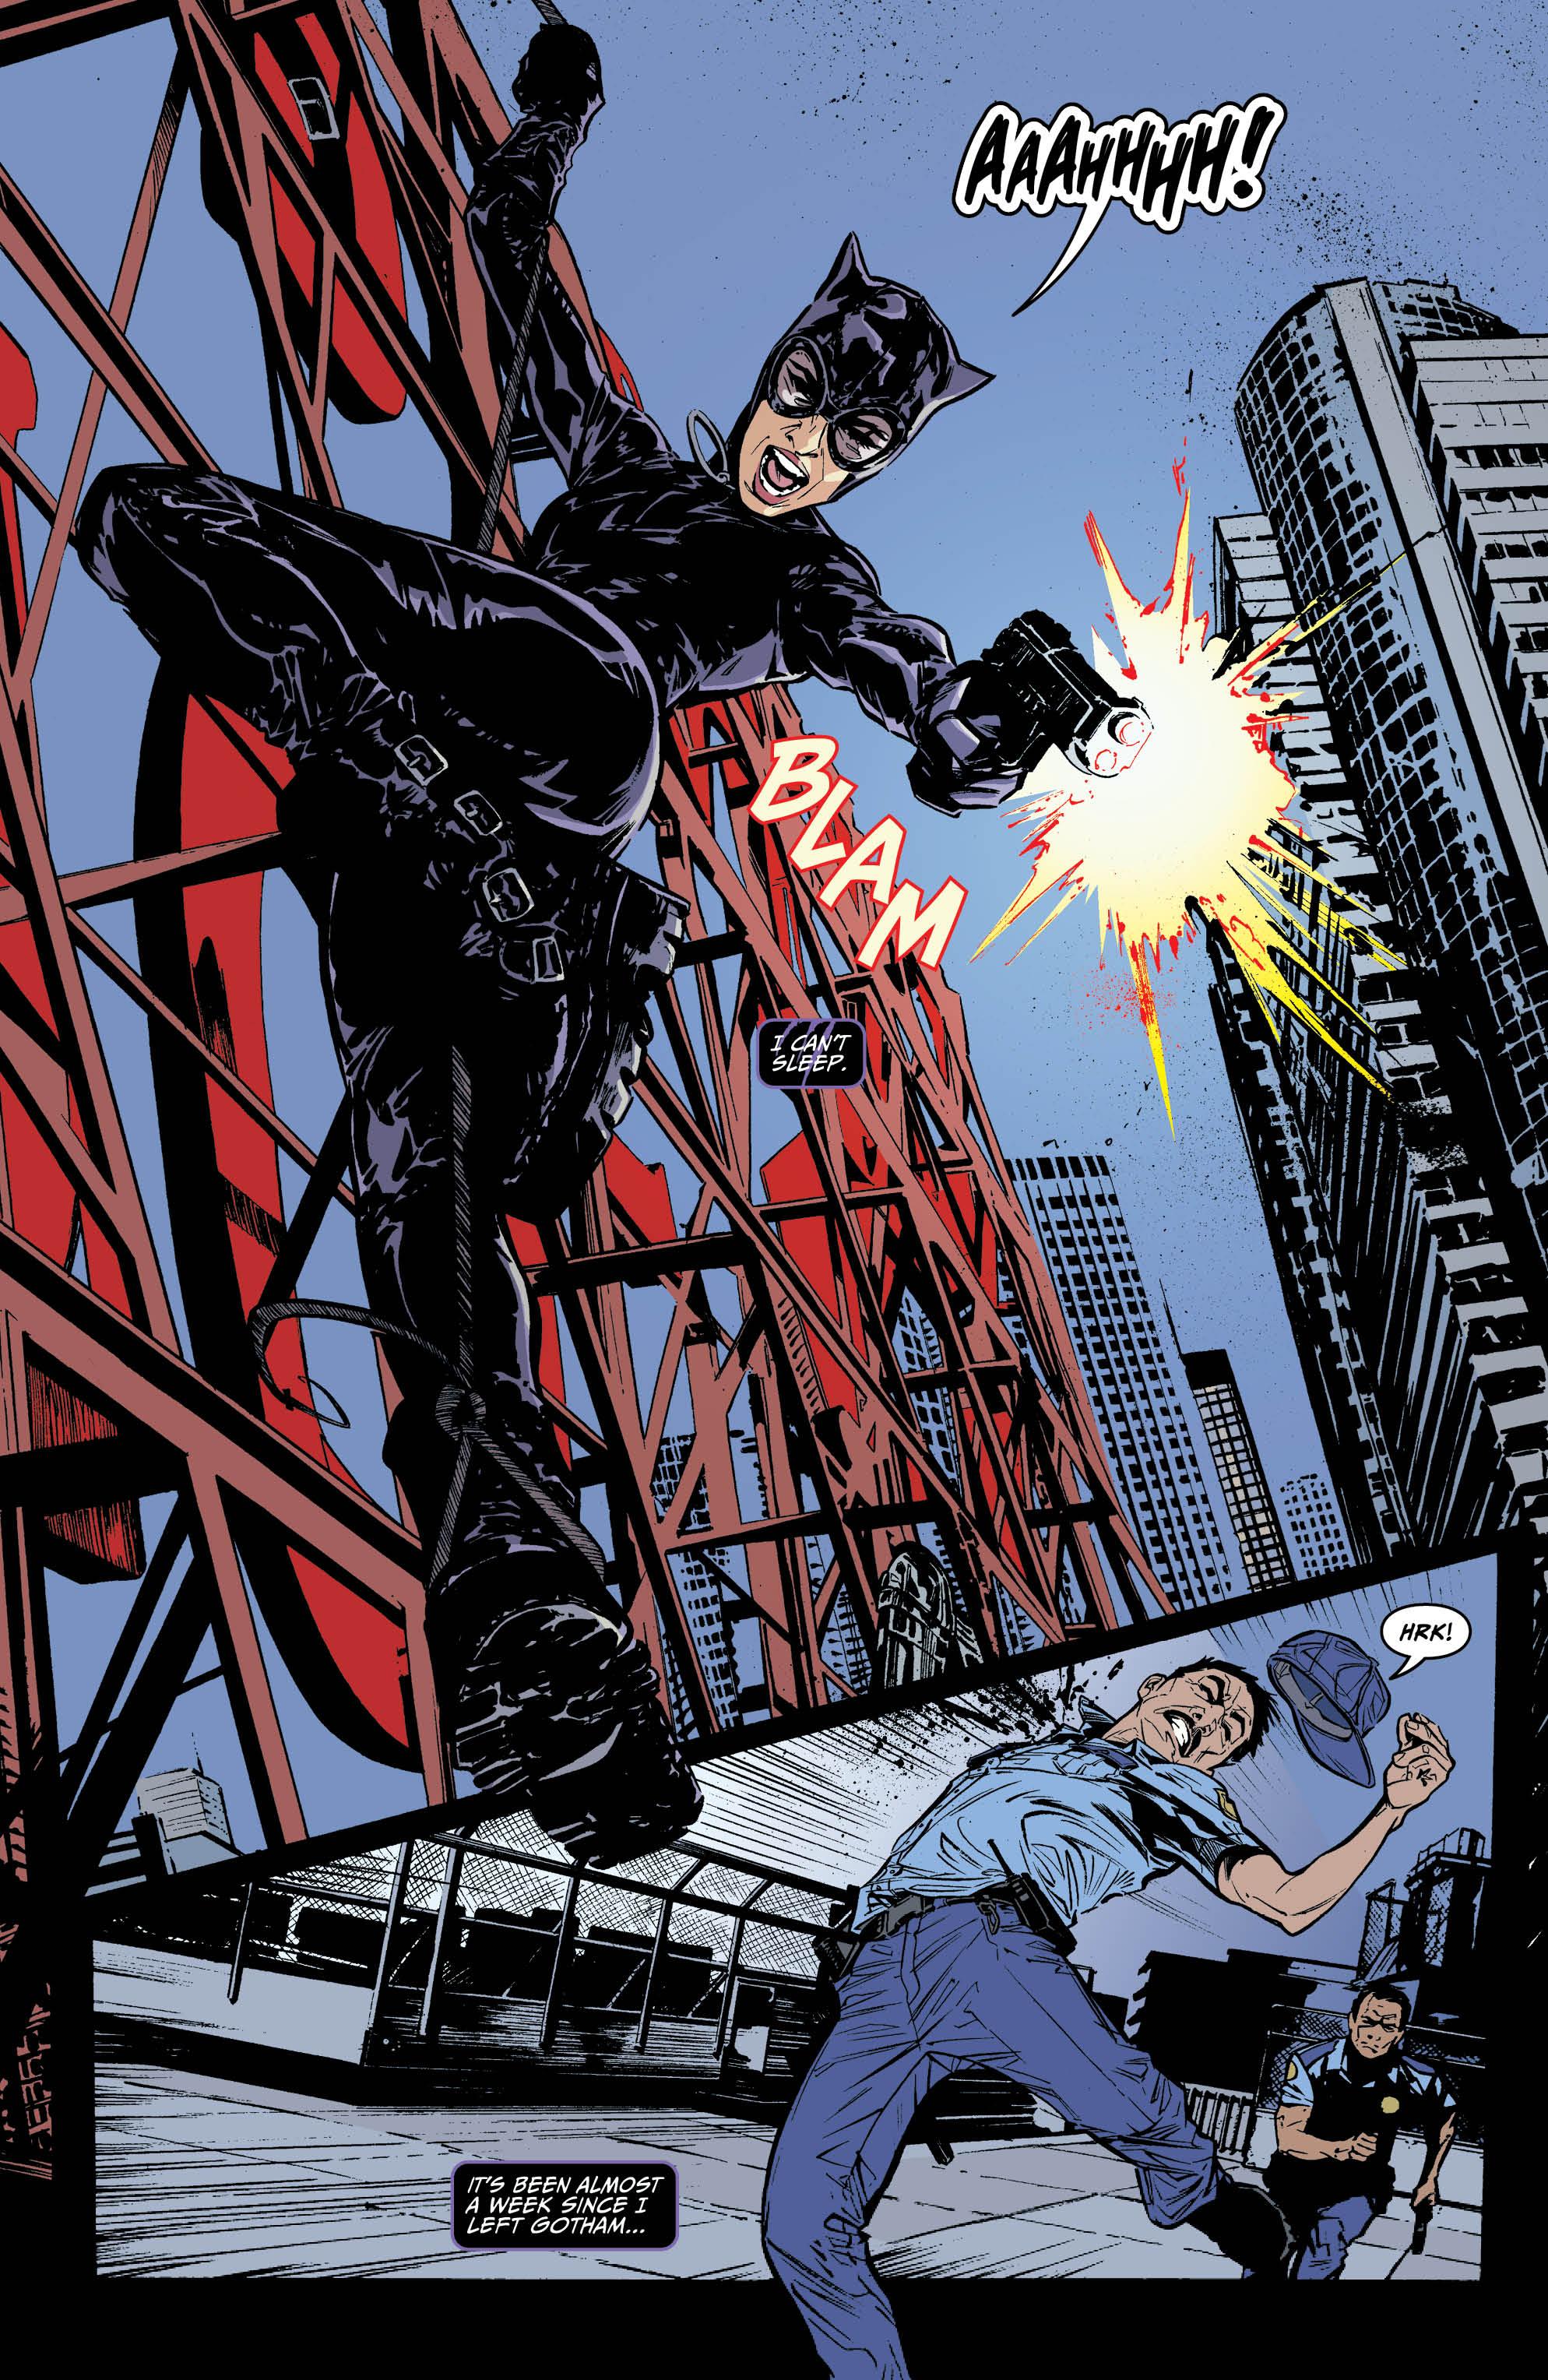 Comic Book Review: Catwoman #1 - Bounding Into Comics